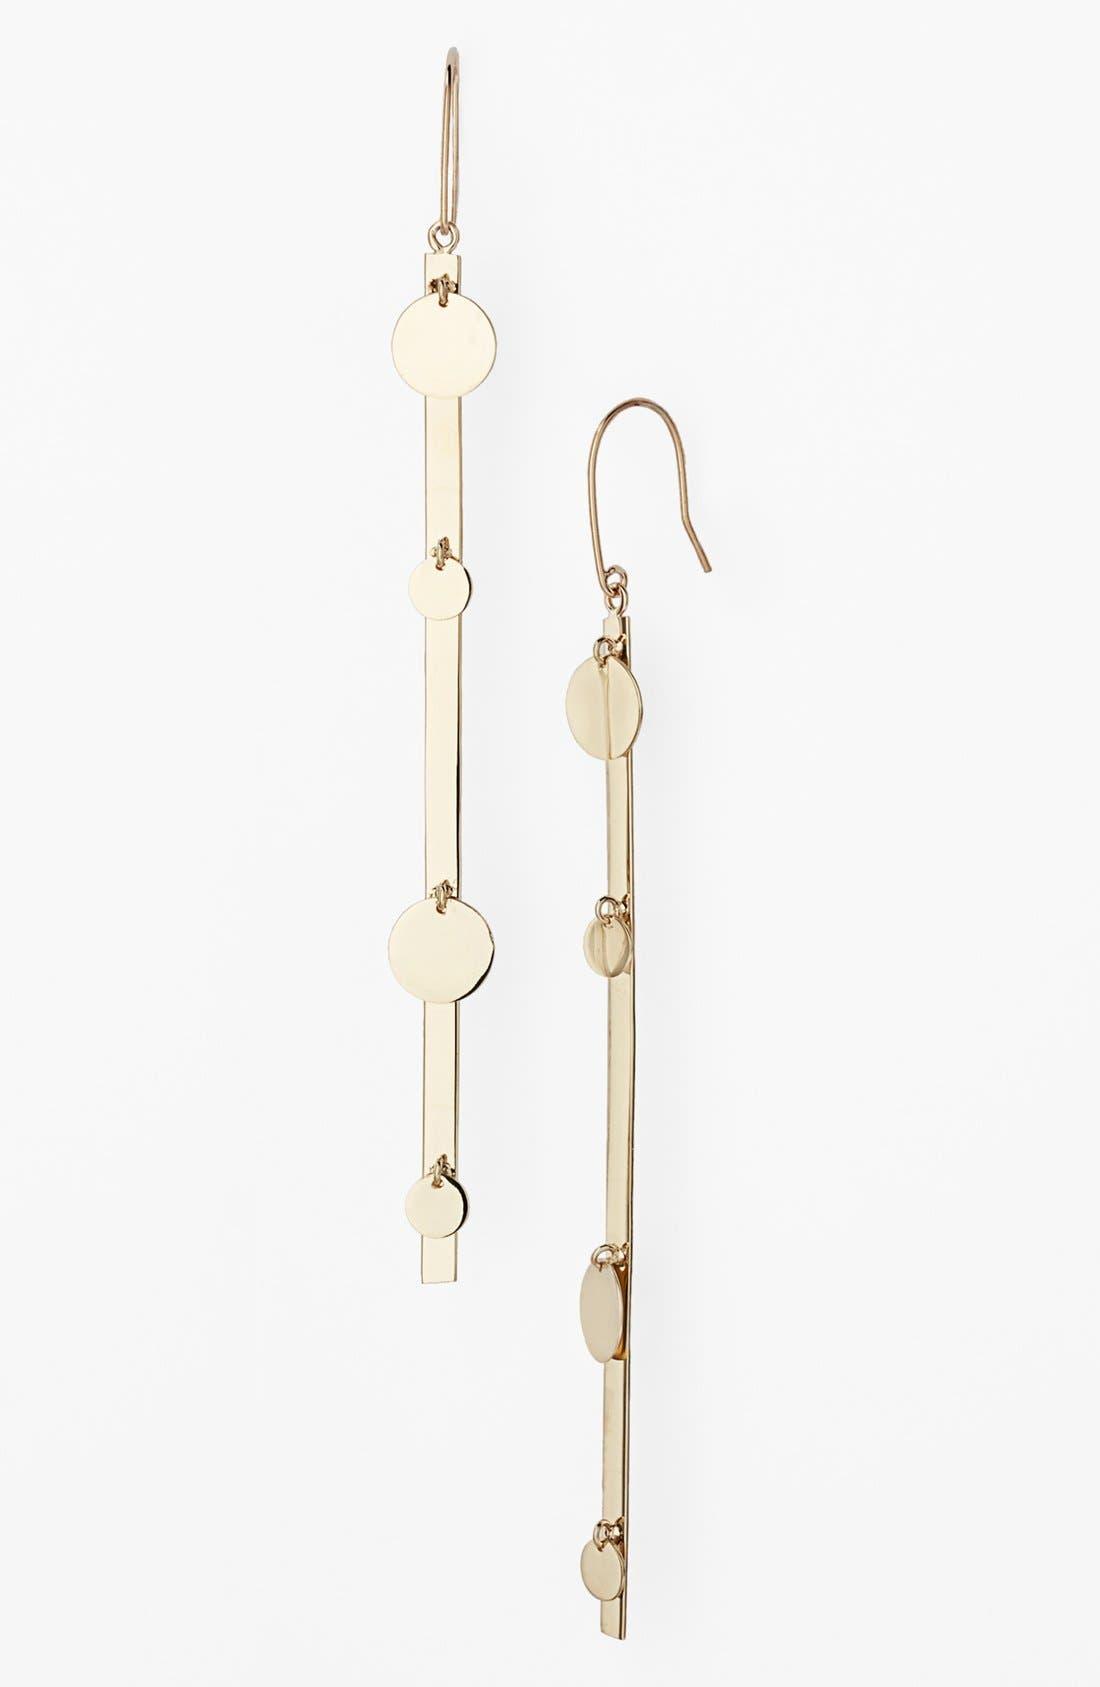 Alternate Image 1 Selected - Lana Jewelry 'Spellbound - Gypsy' Bar Drop Earrings